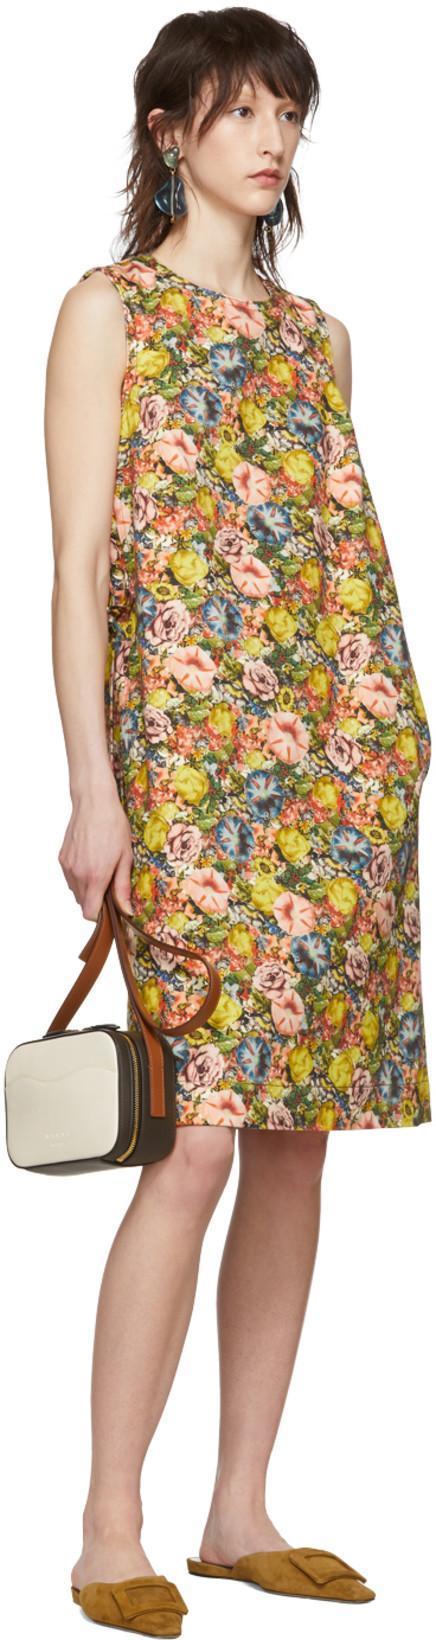 2ea7c9d10 Marni Multicolor Flowers A-Line Dress In Ely48 Acid   ModeSens